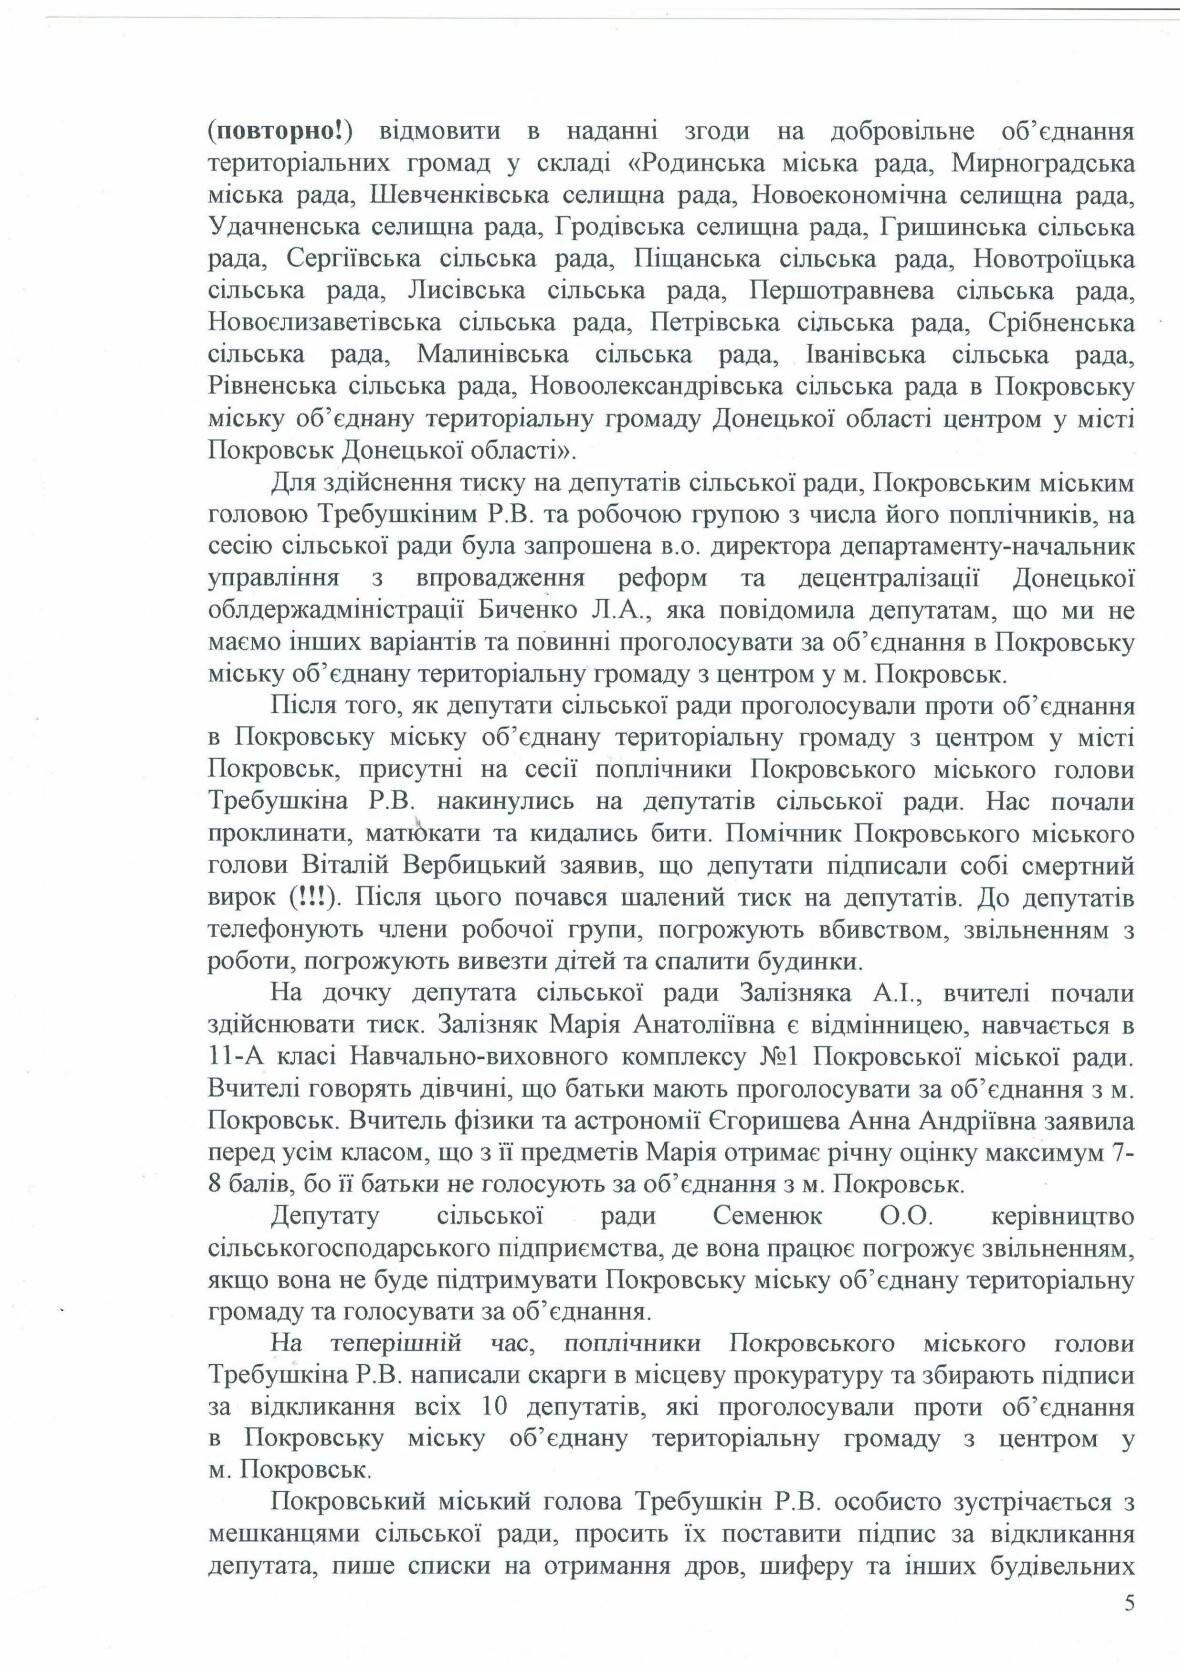 Децентрализация по-покровски: жители поселка Первое Мая просят помощи у Президента, фото-5